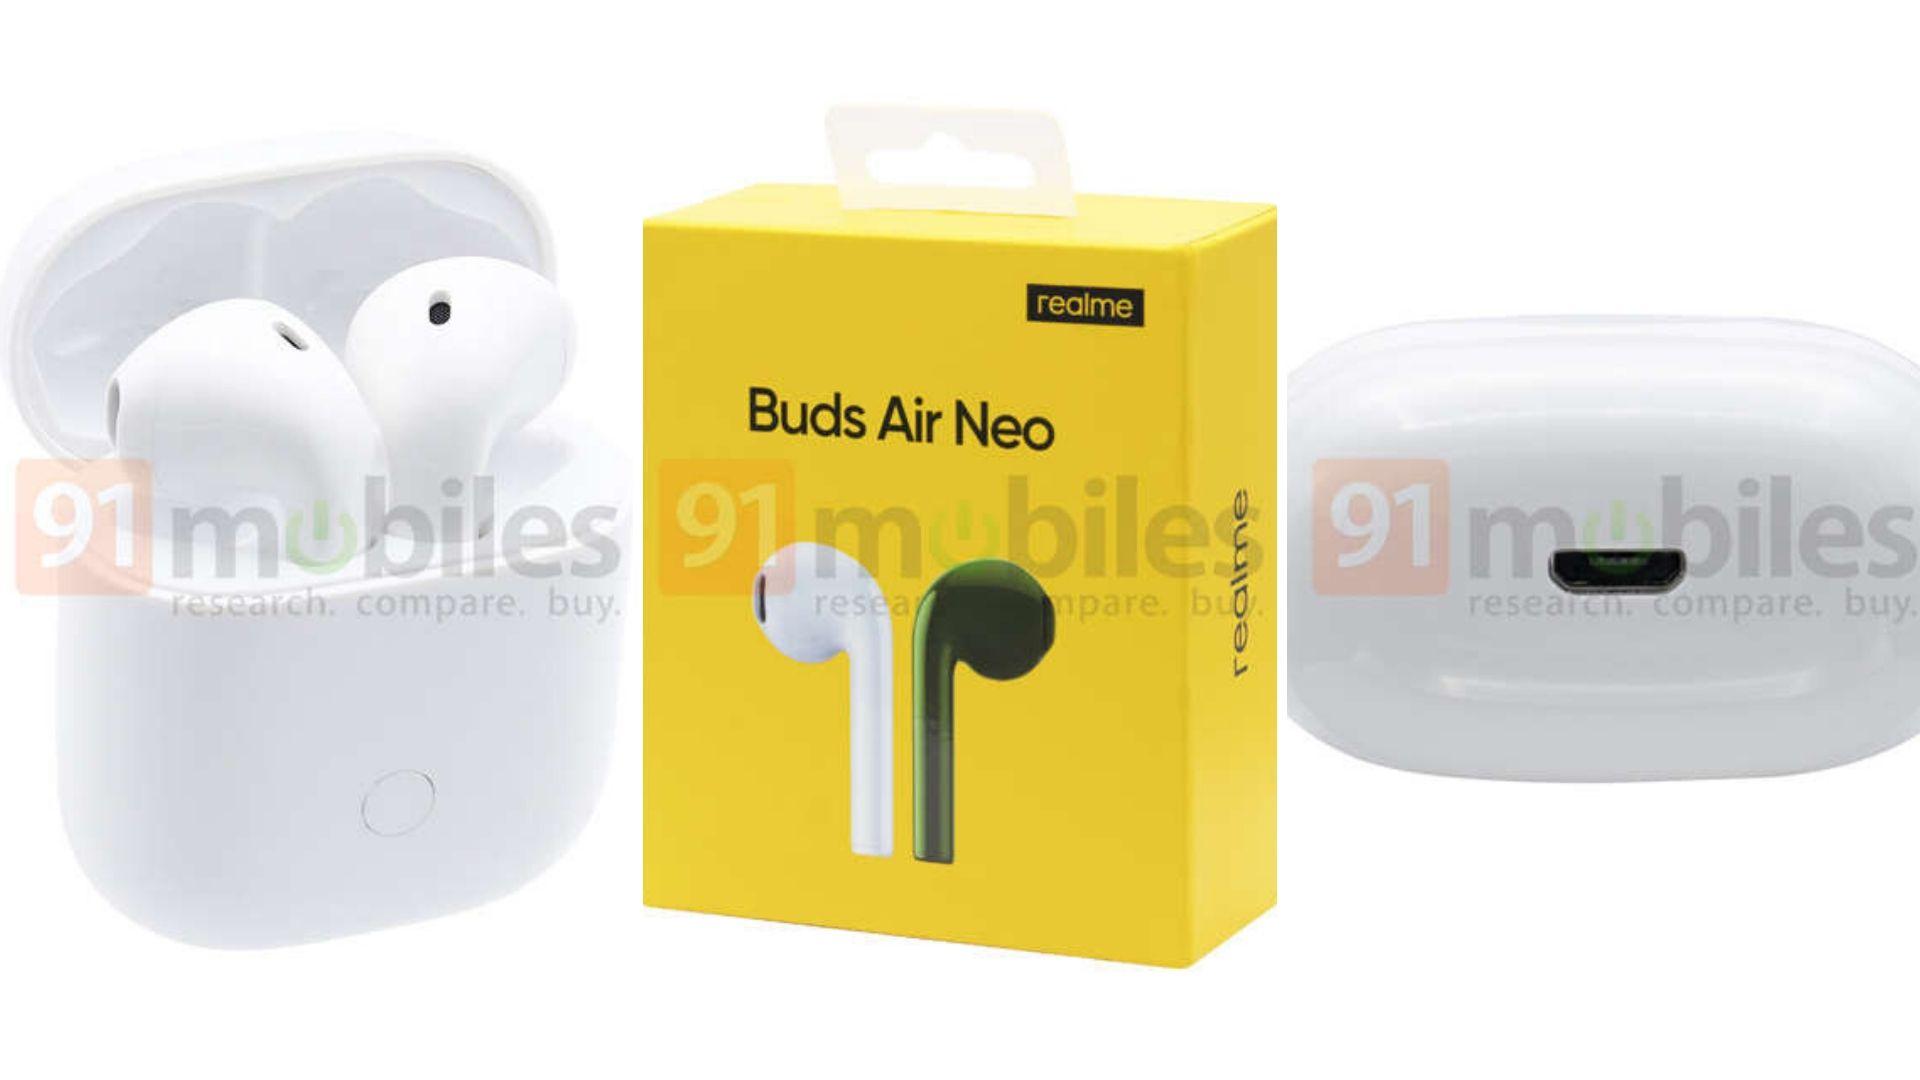 Realme Air Buds Neo 91mobiles Leak Header